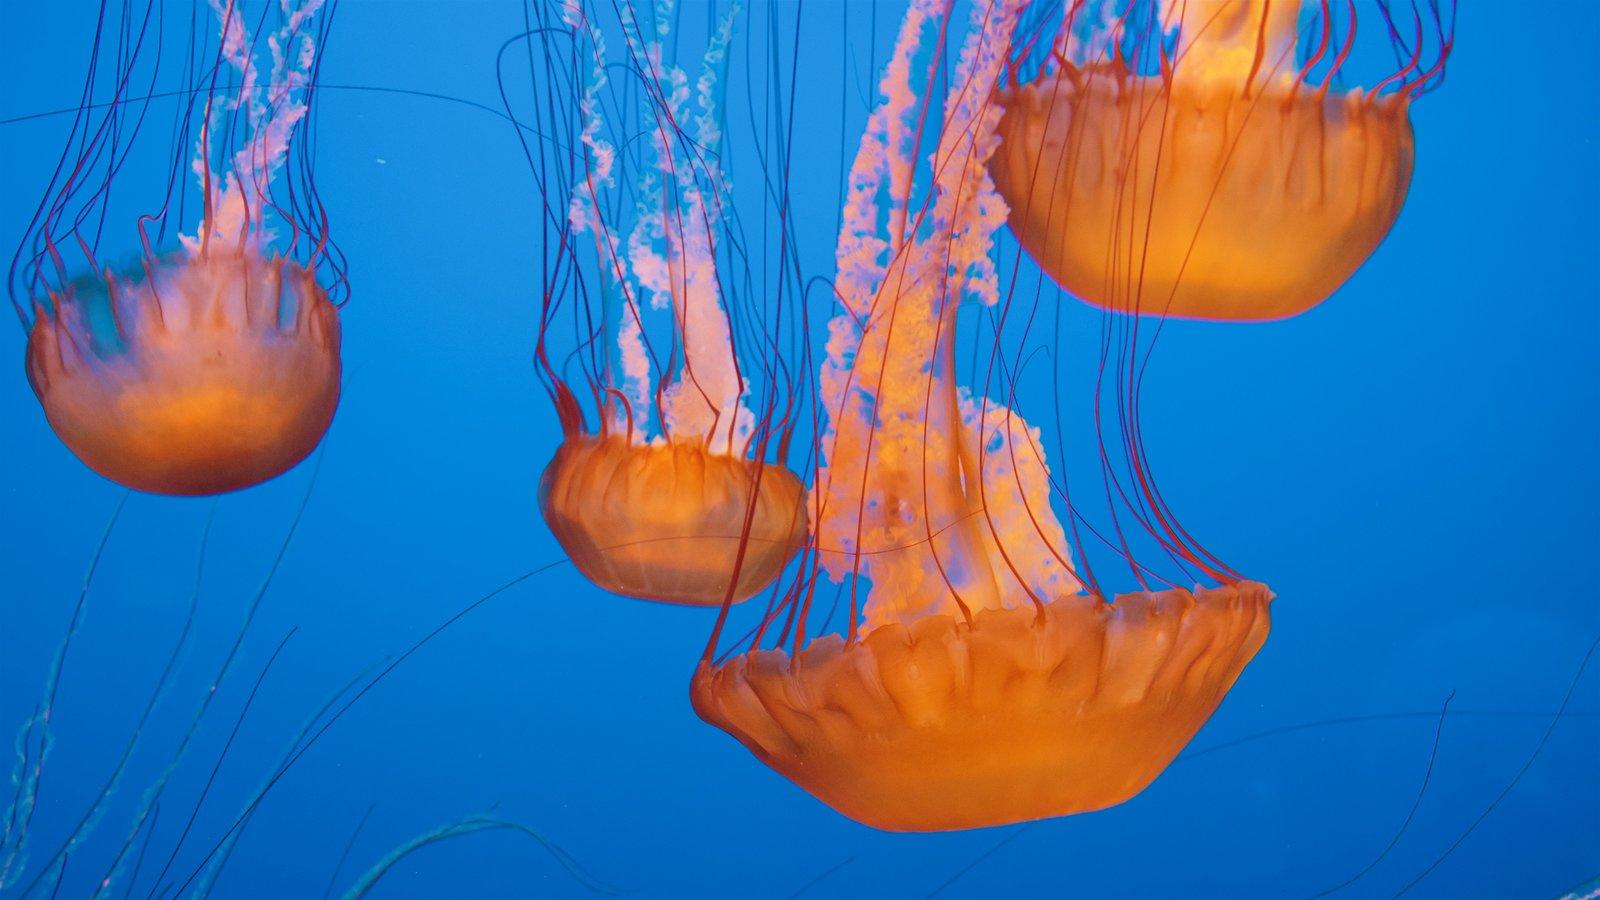 Monterey Bay Aquarium showing marine life